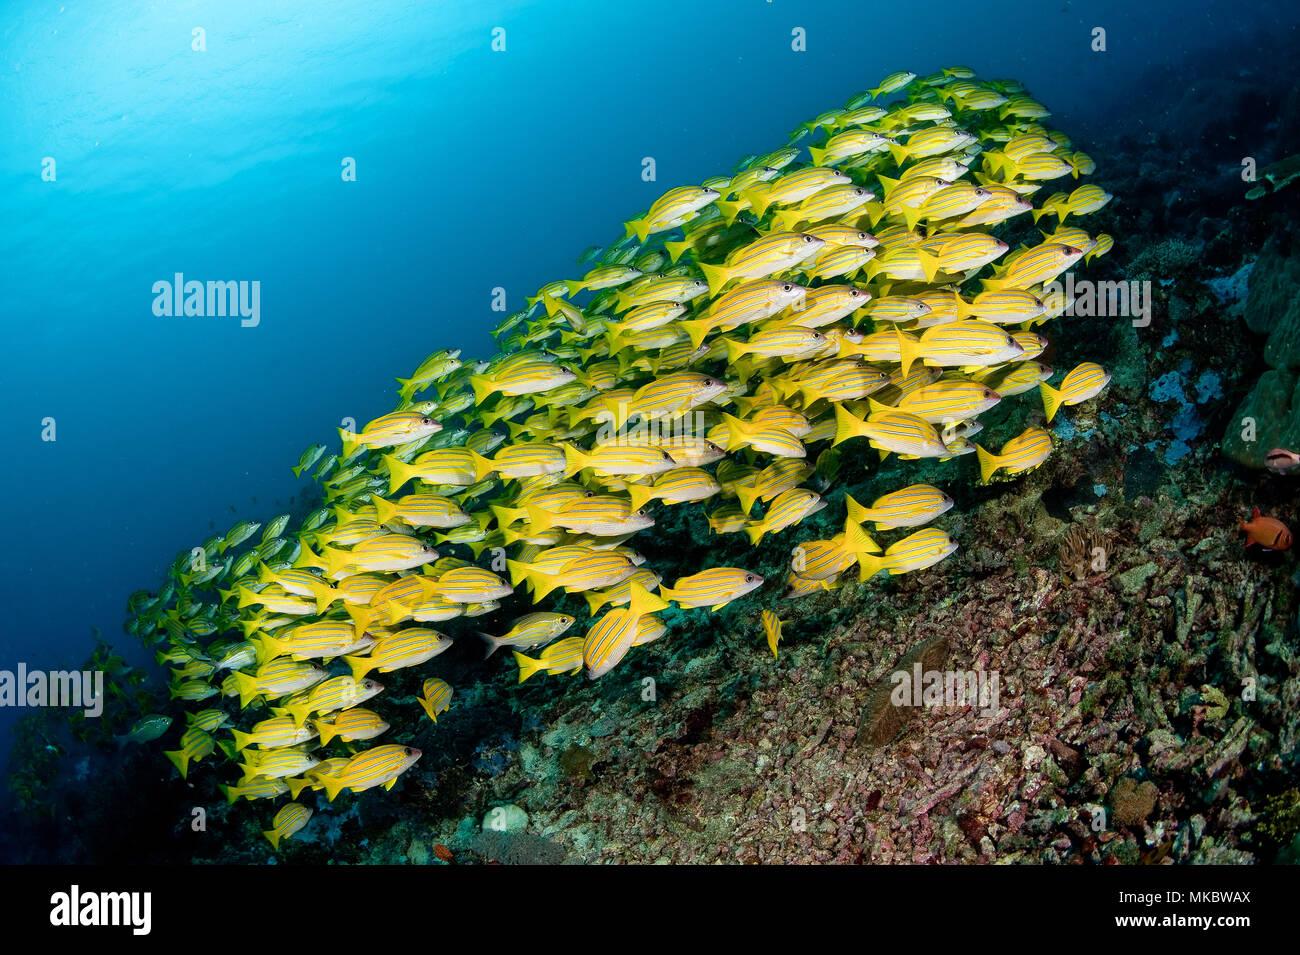 Tanzanian Mafia Island - Stock Image